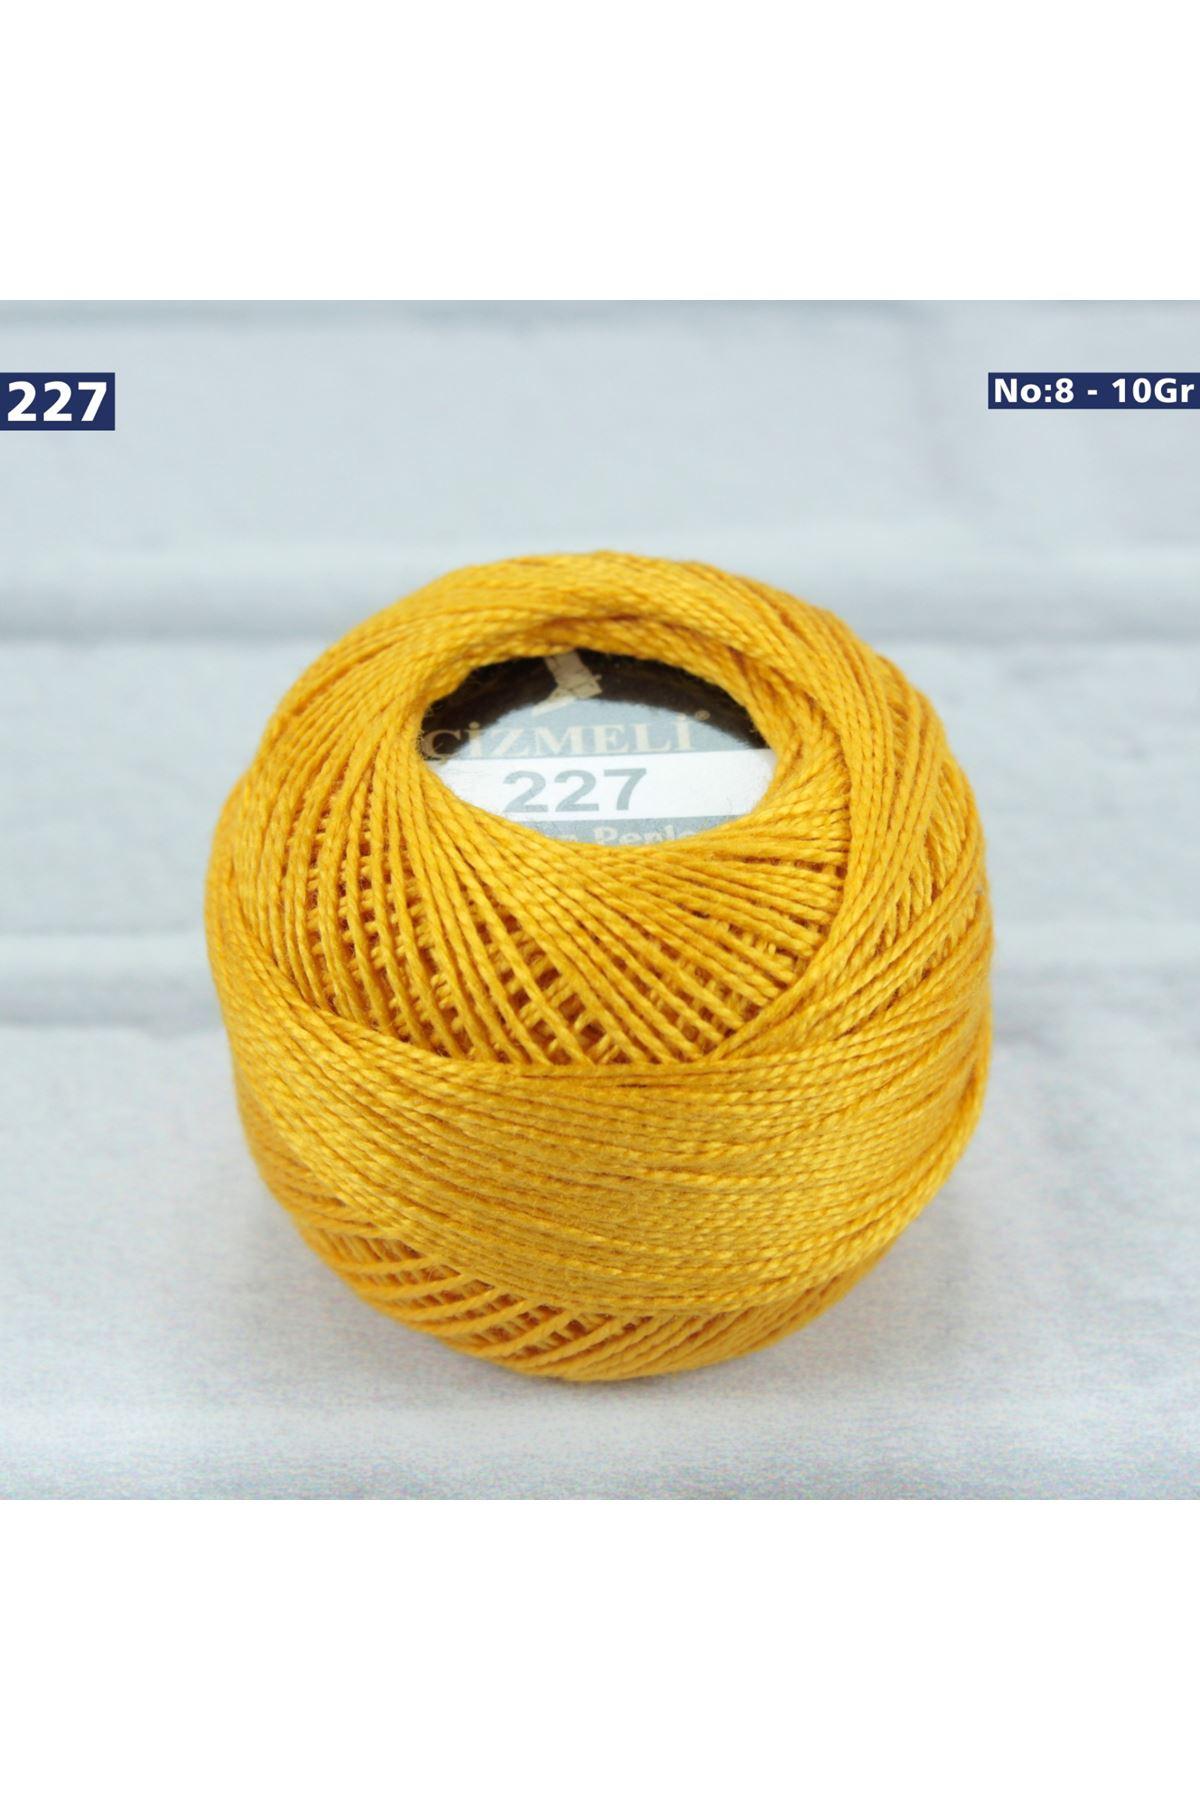 Çizmeli Cotton Perle Nakış İpliği No: 227